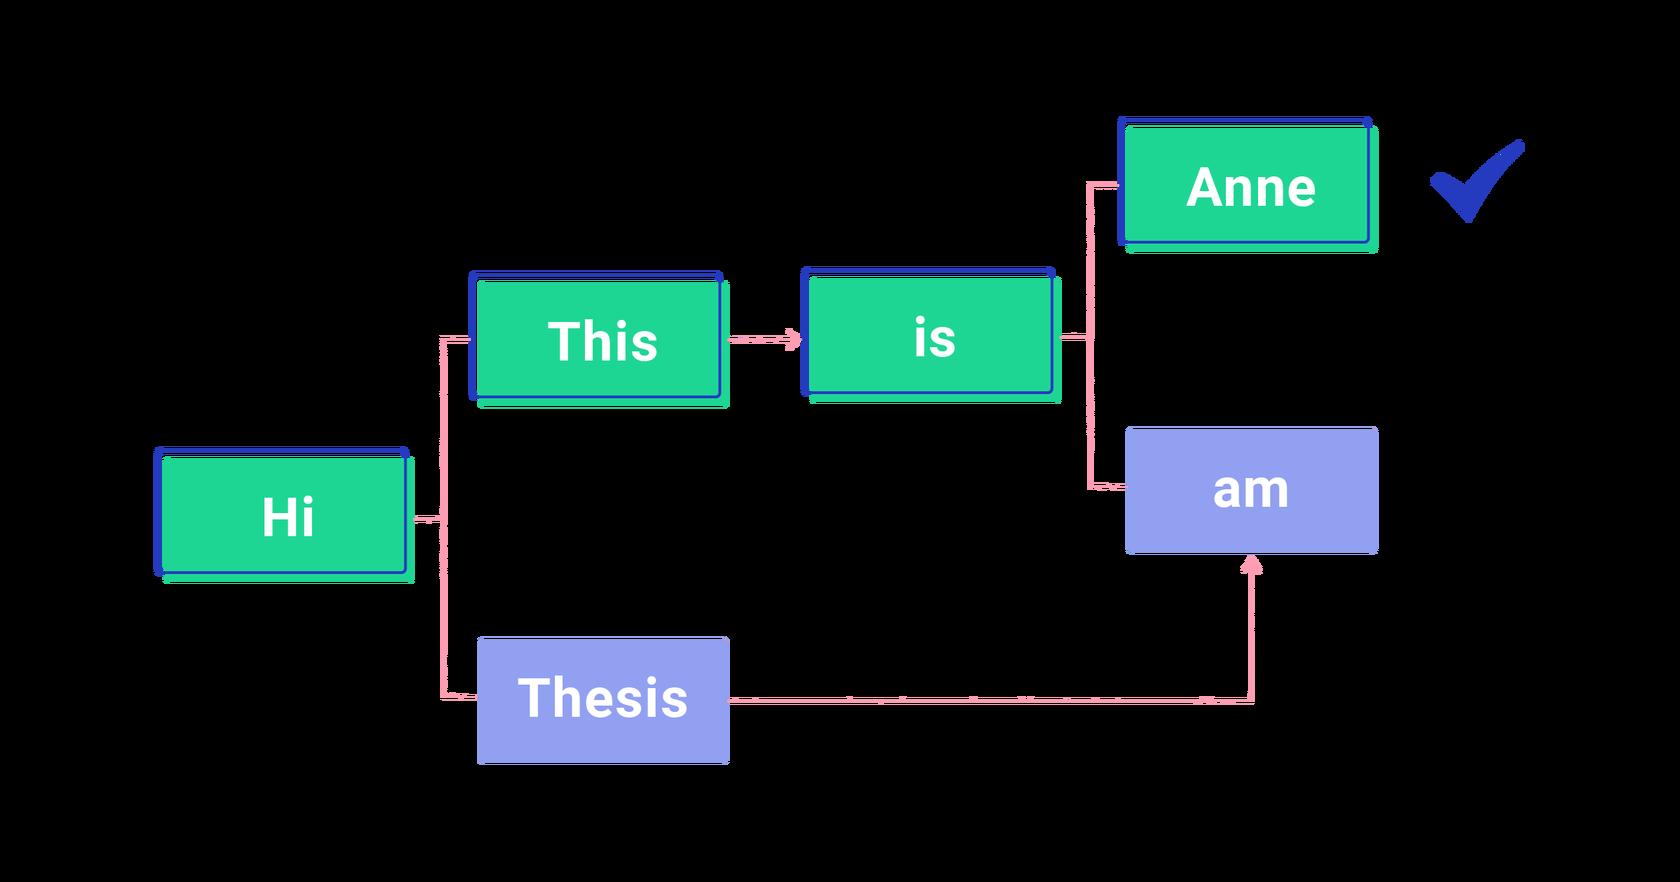 lattice path in automatic speech recognition